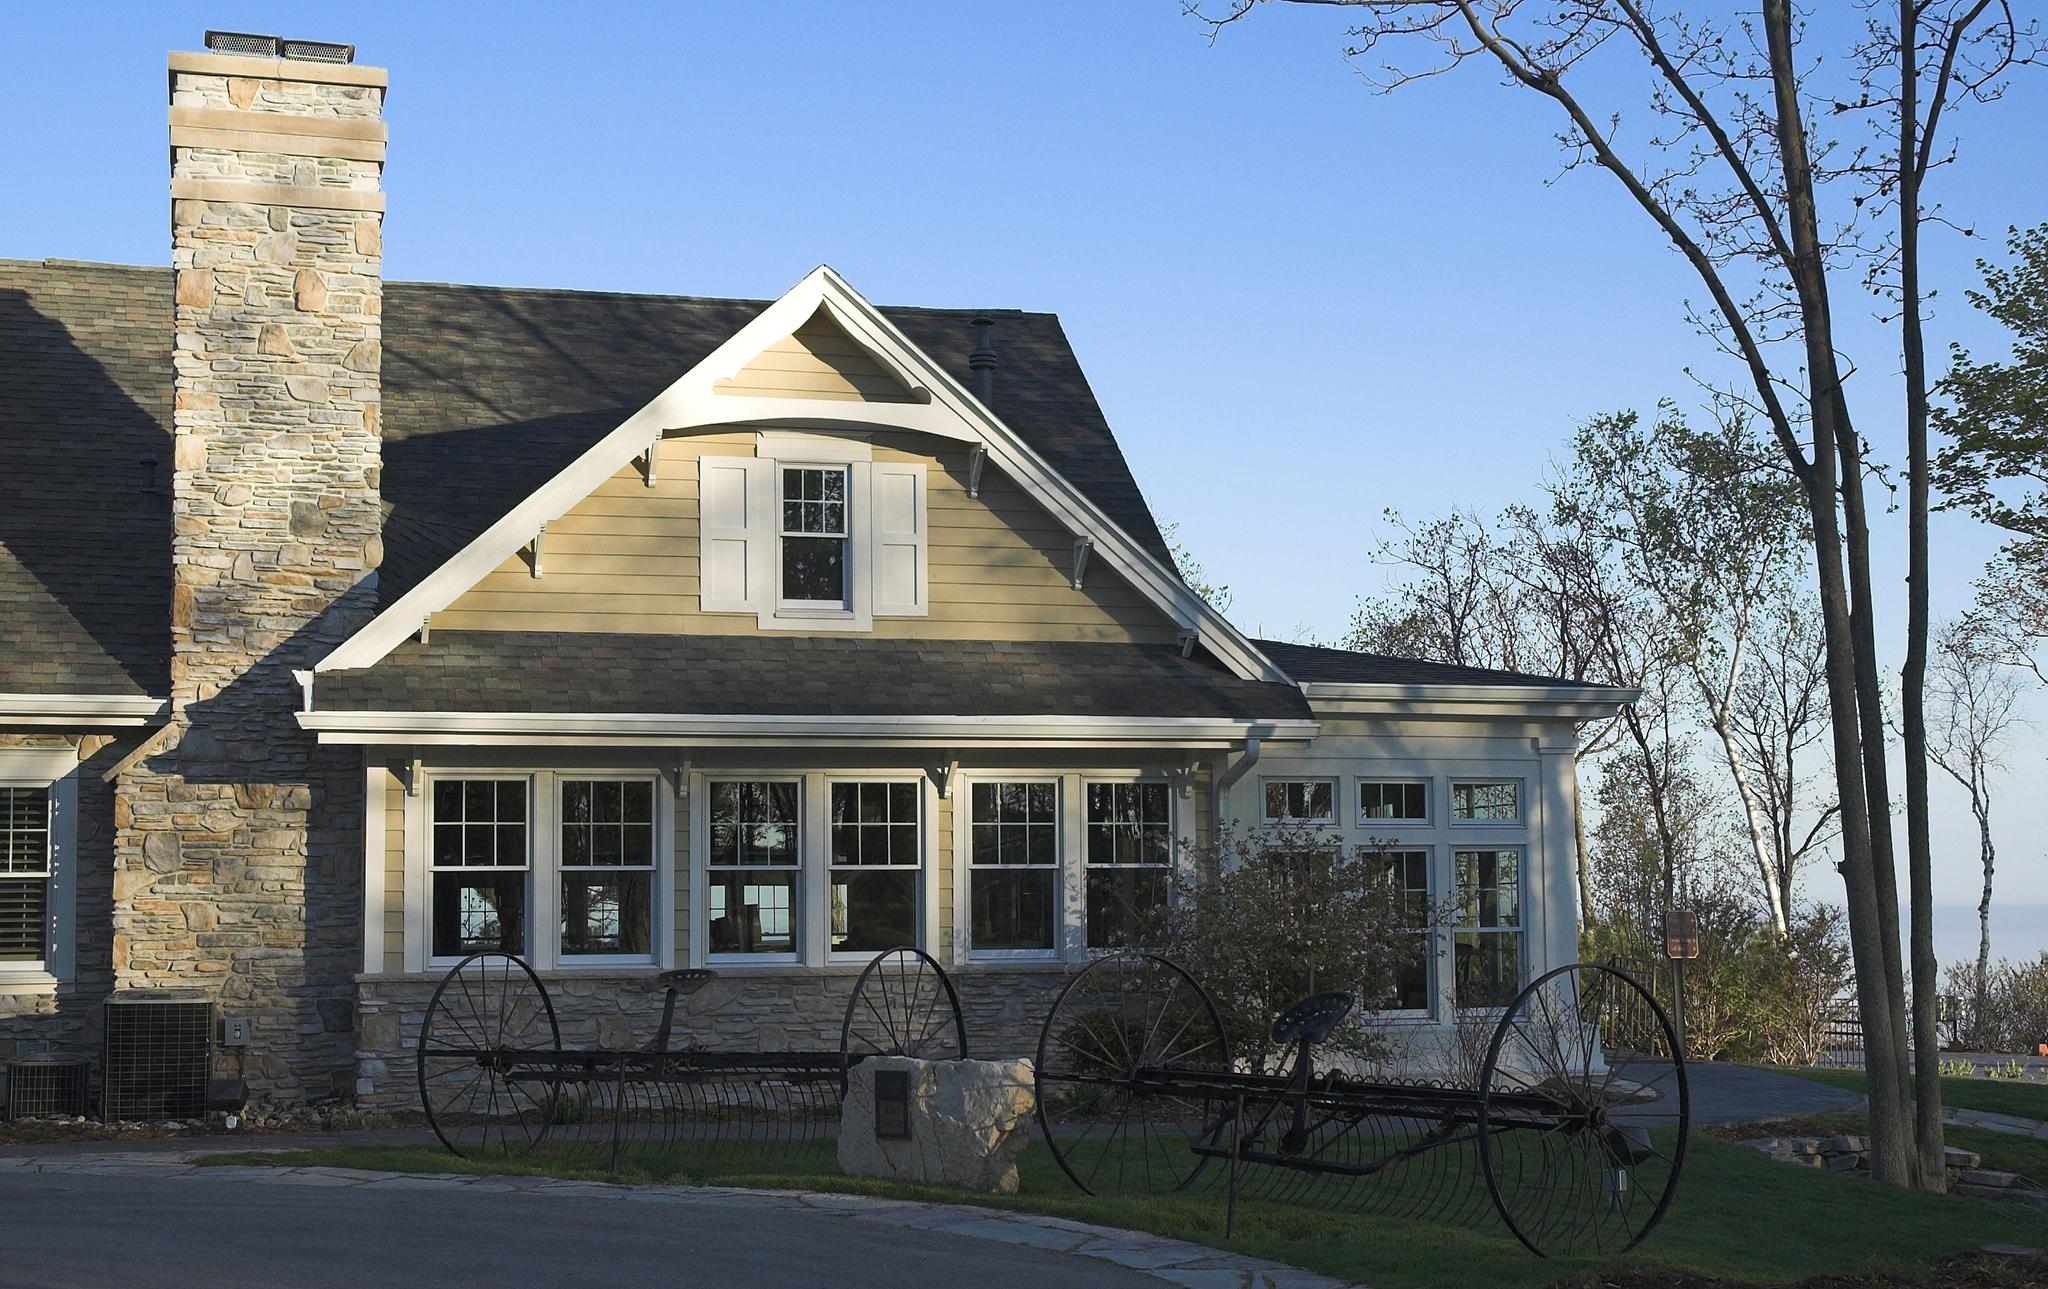 1_Horseshoe-Bay-Farms-Cottages